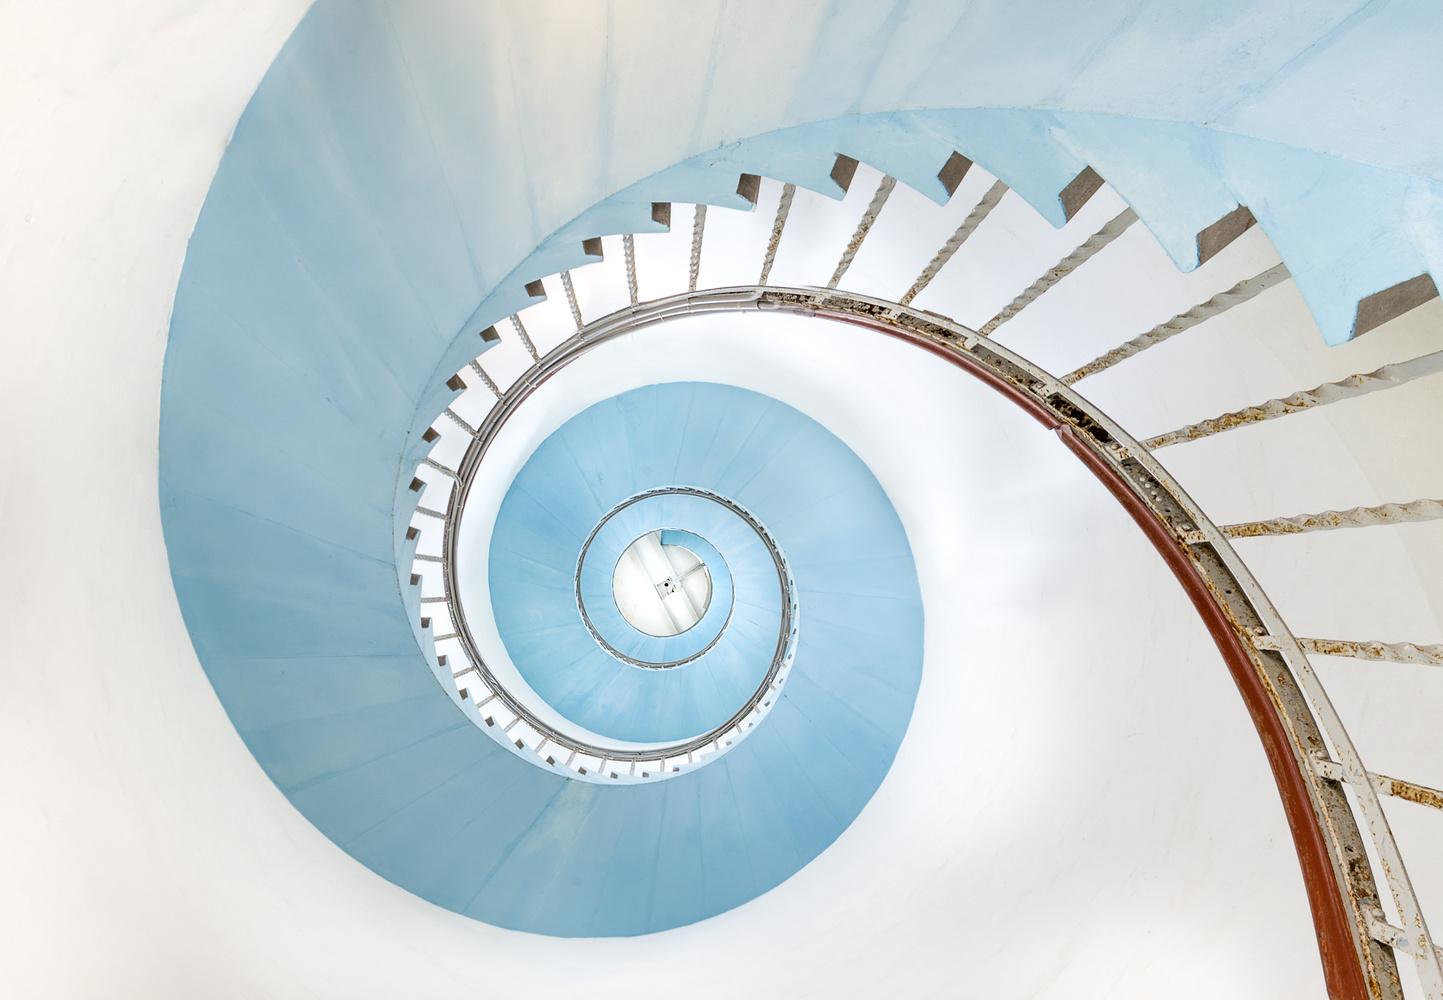 Lighthouse by John Petter Hagen